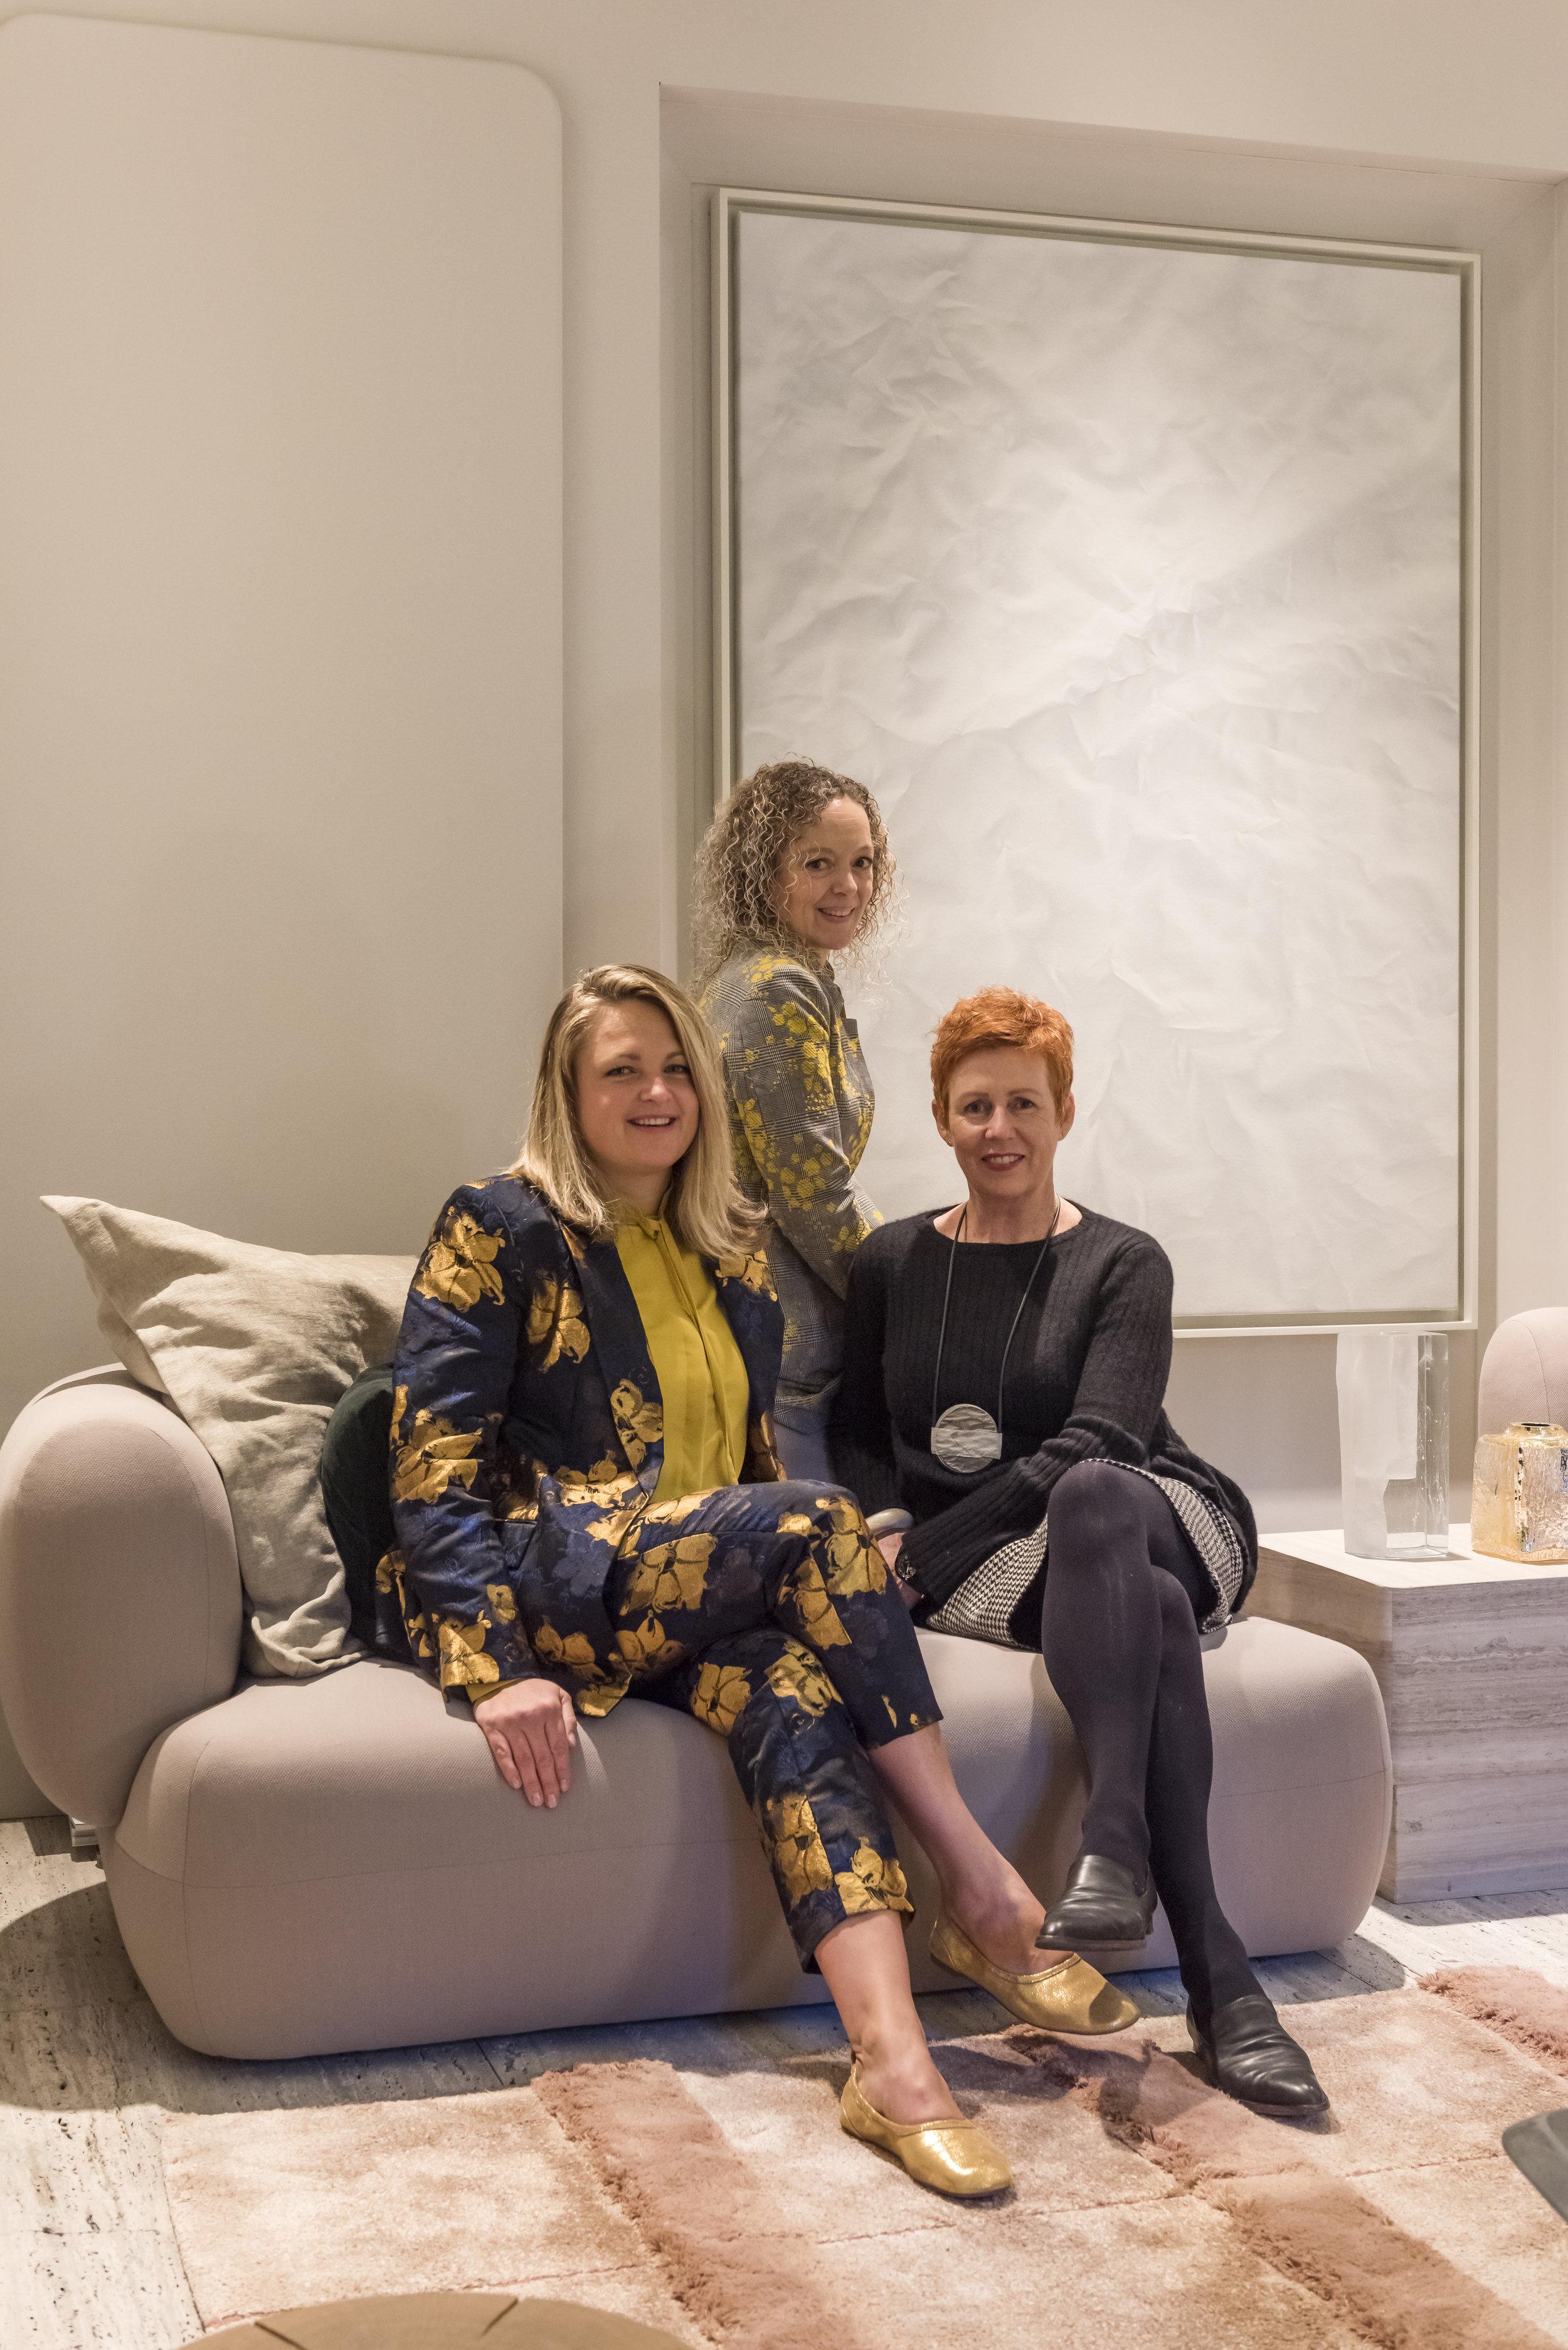 Seated with J.Phine designers, Nannette van der Vooren and Natasja Molenaar.  Photo by Andreas von Einsiedel